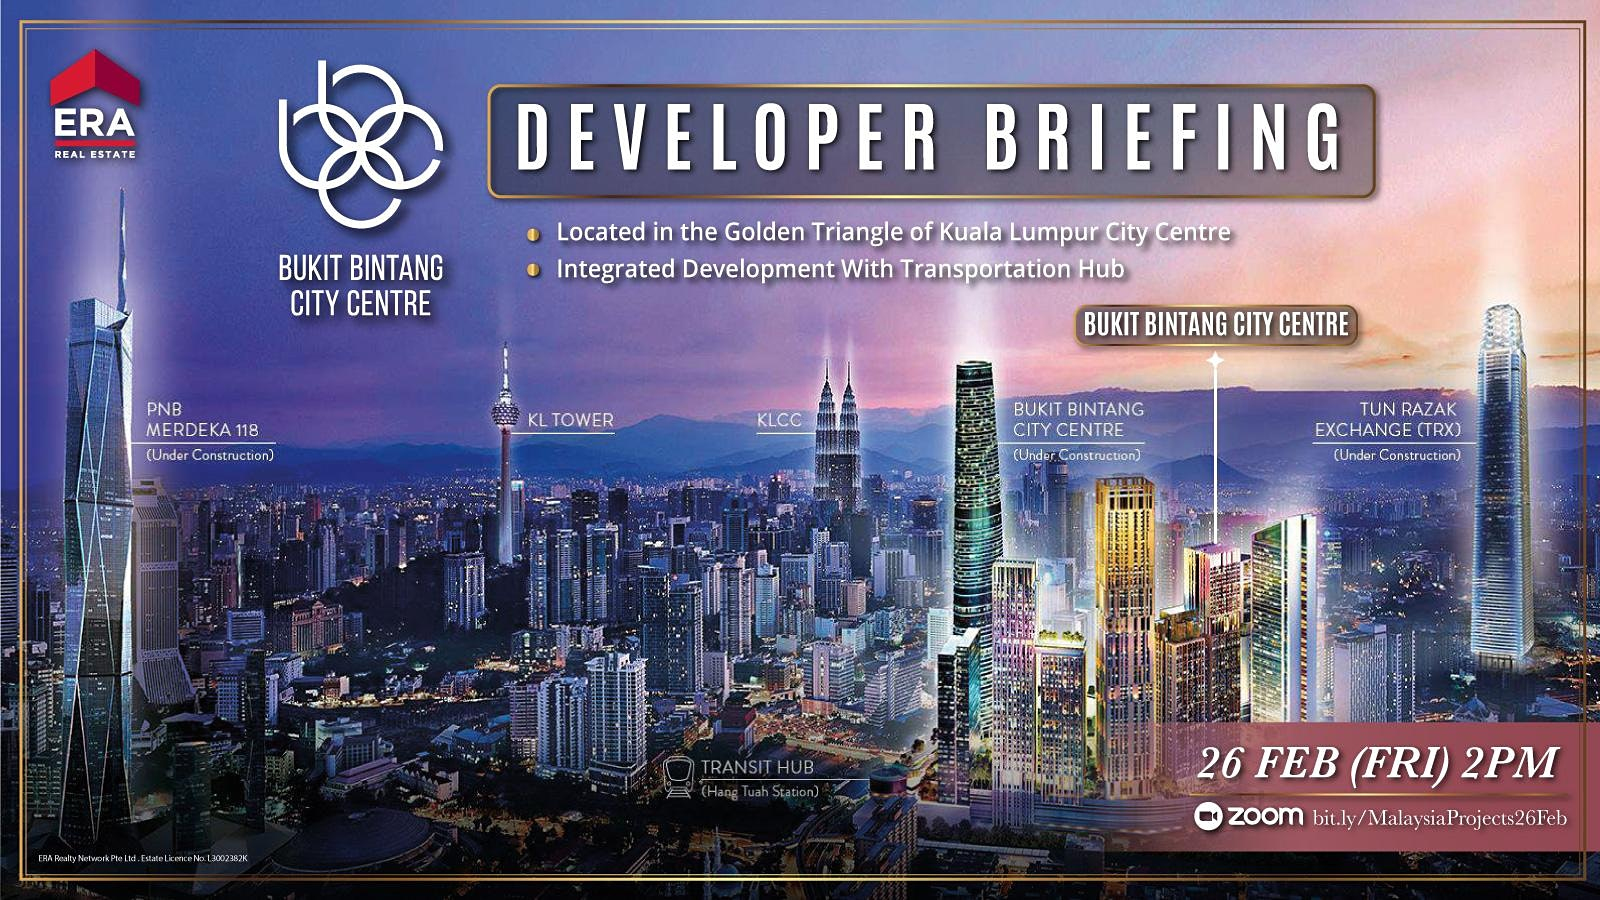 Bukit Bintang Developer Briefing